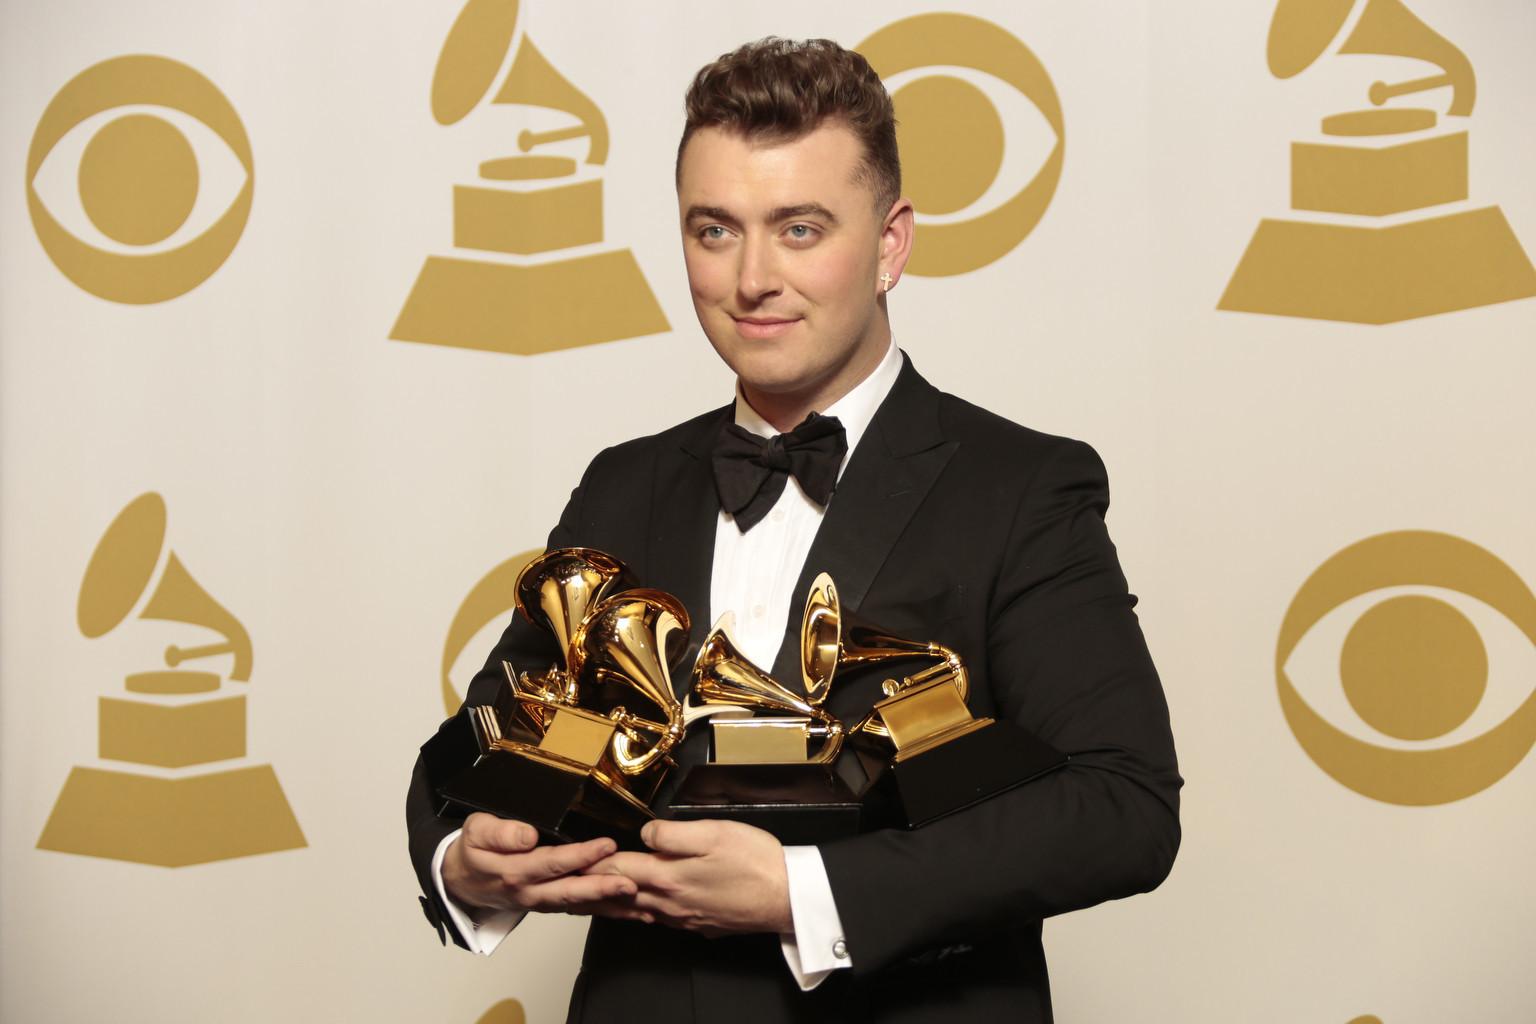 Grammy Awards: Grammy Awards Move To Monday Night For 2016